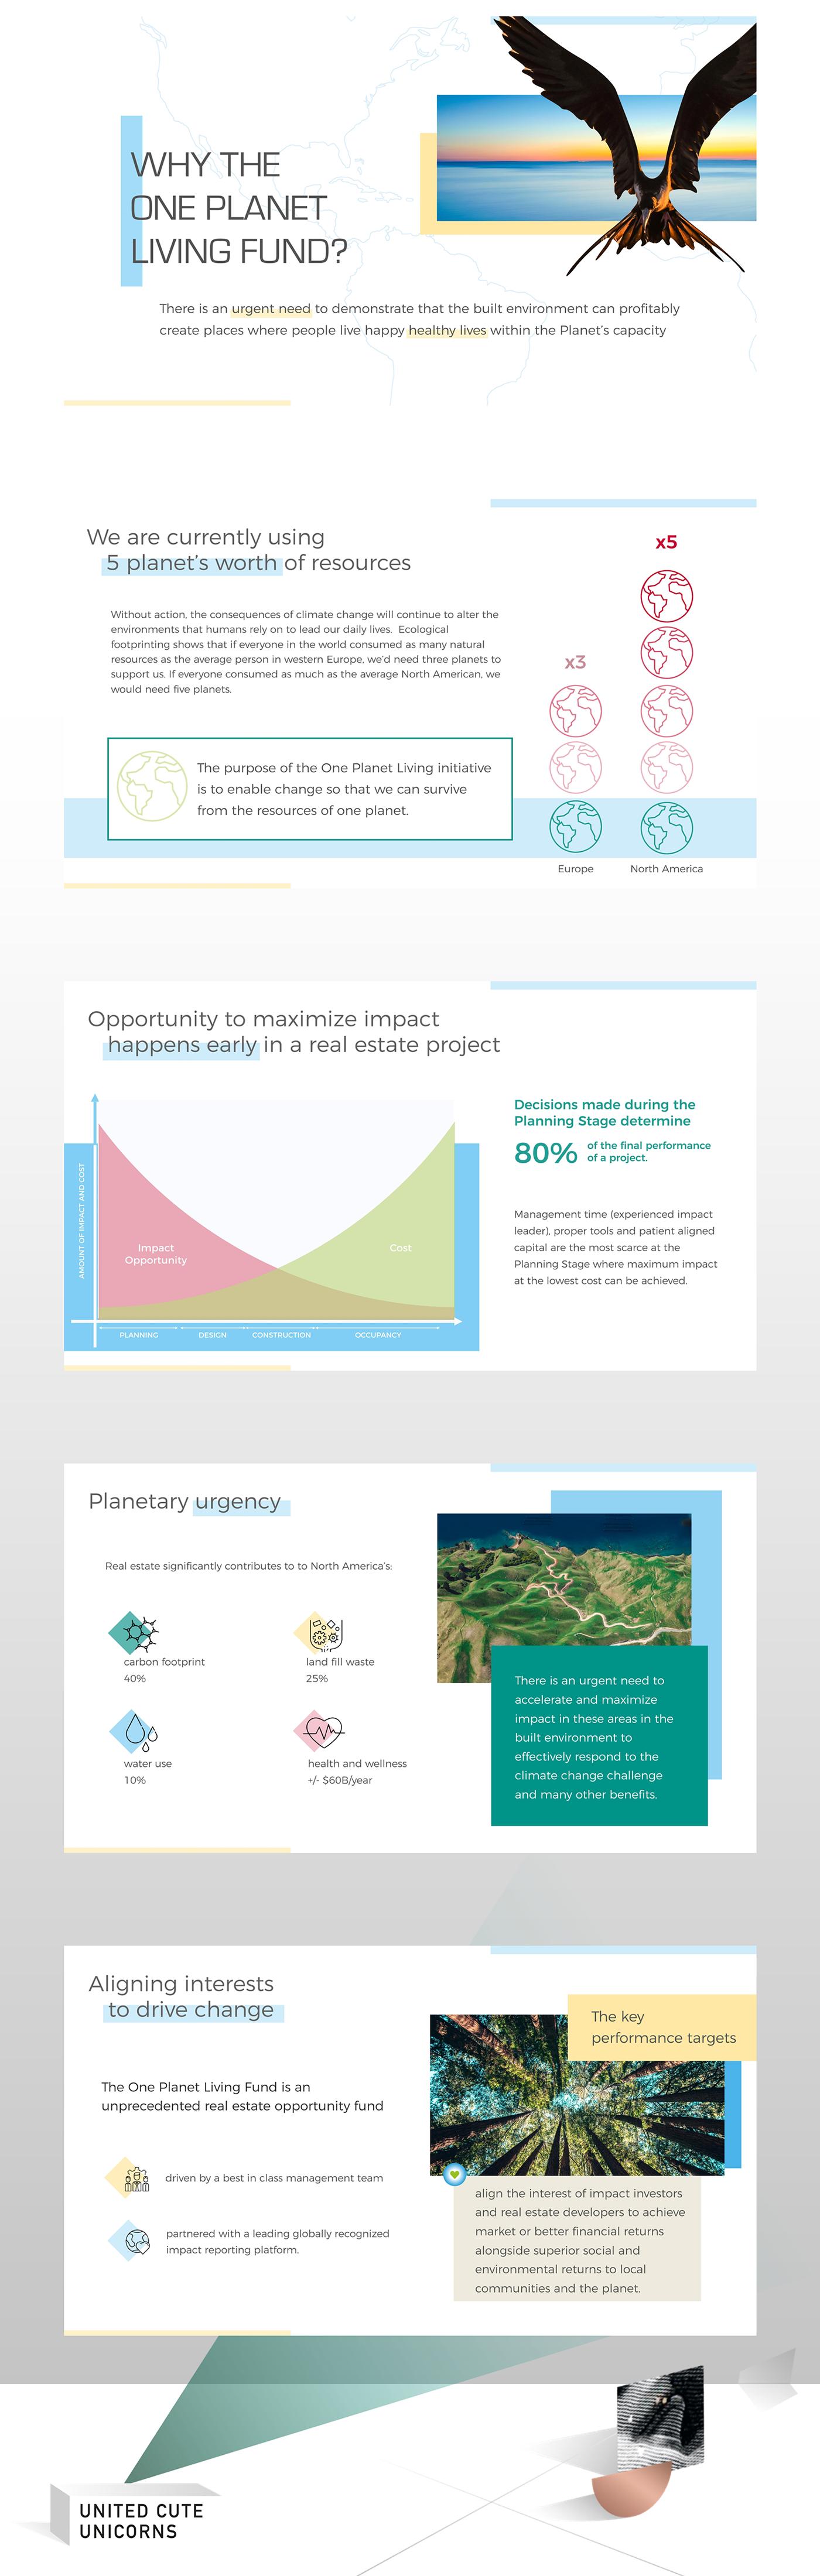 PPT key Powerpoint Keynote presentation pitch deck